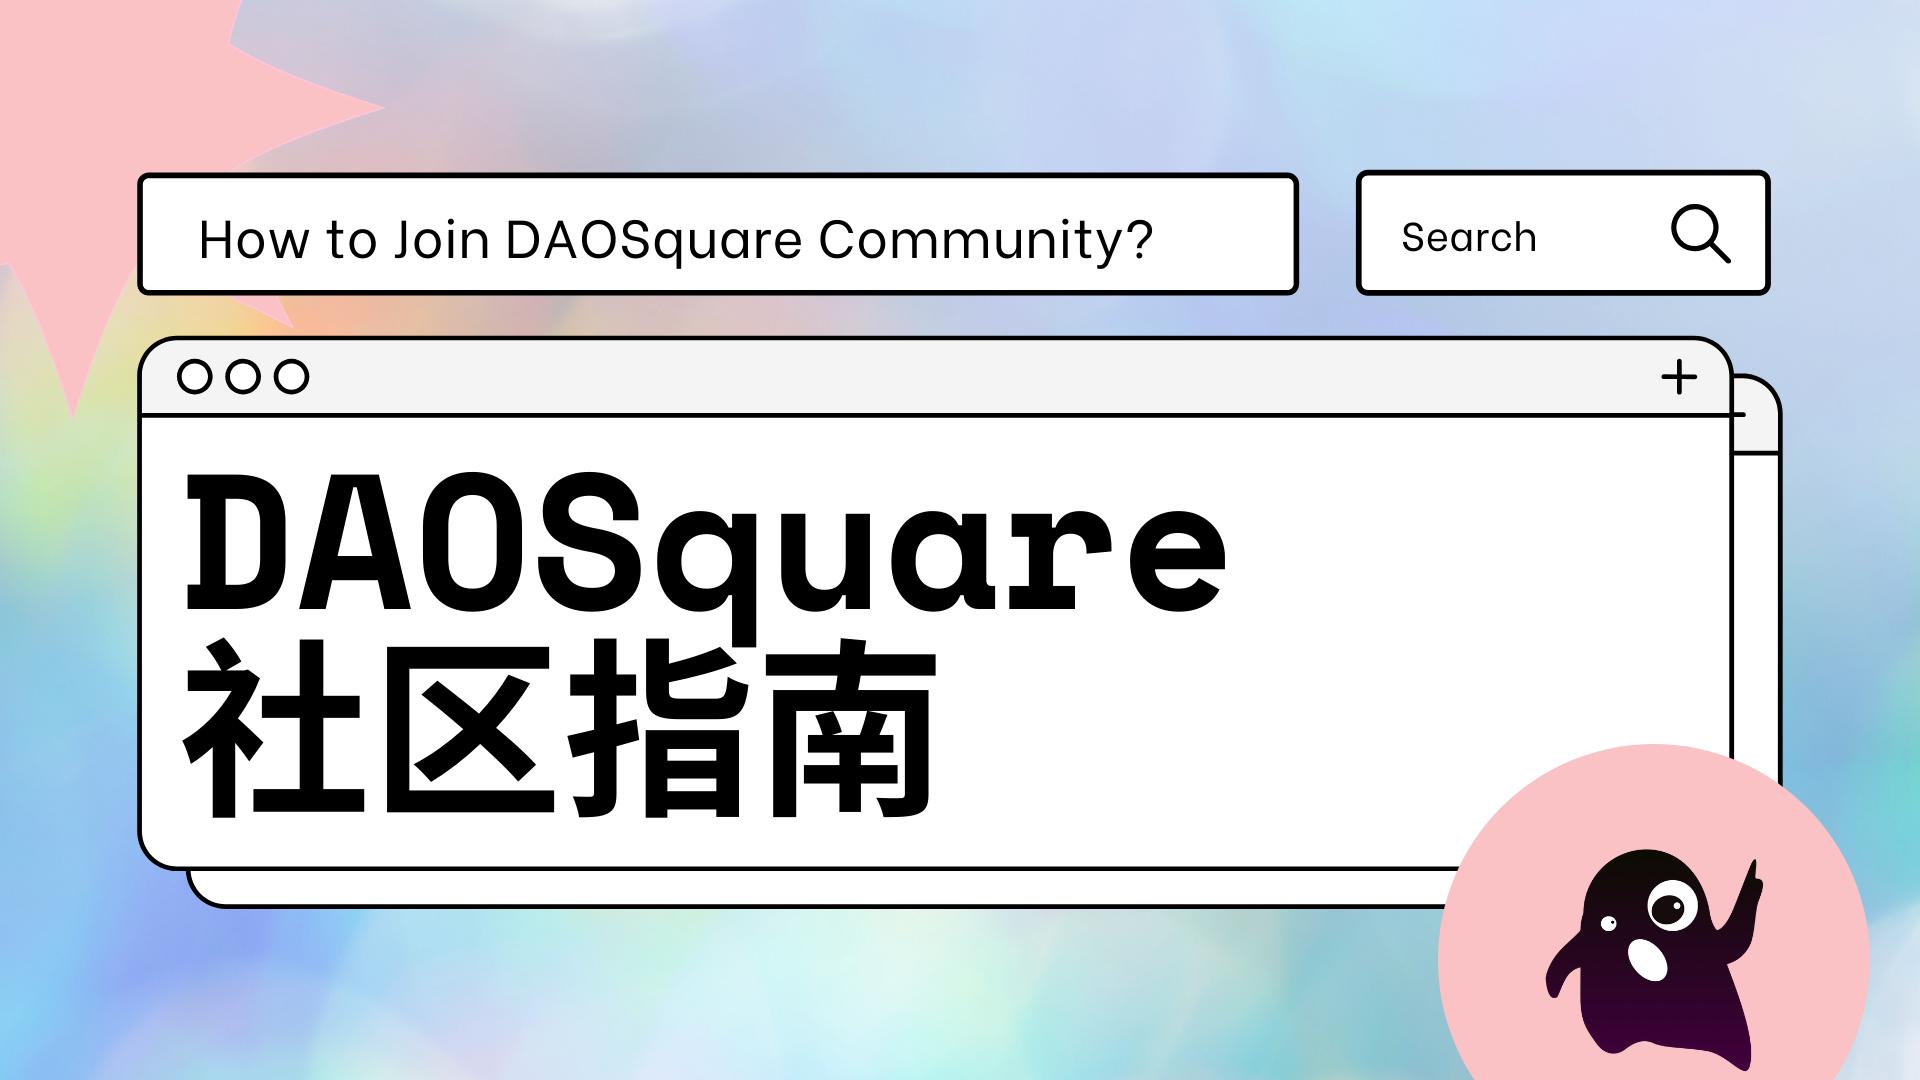 DAOSquare 社区指南(草案)